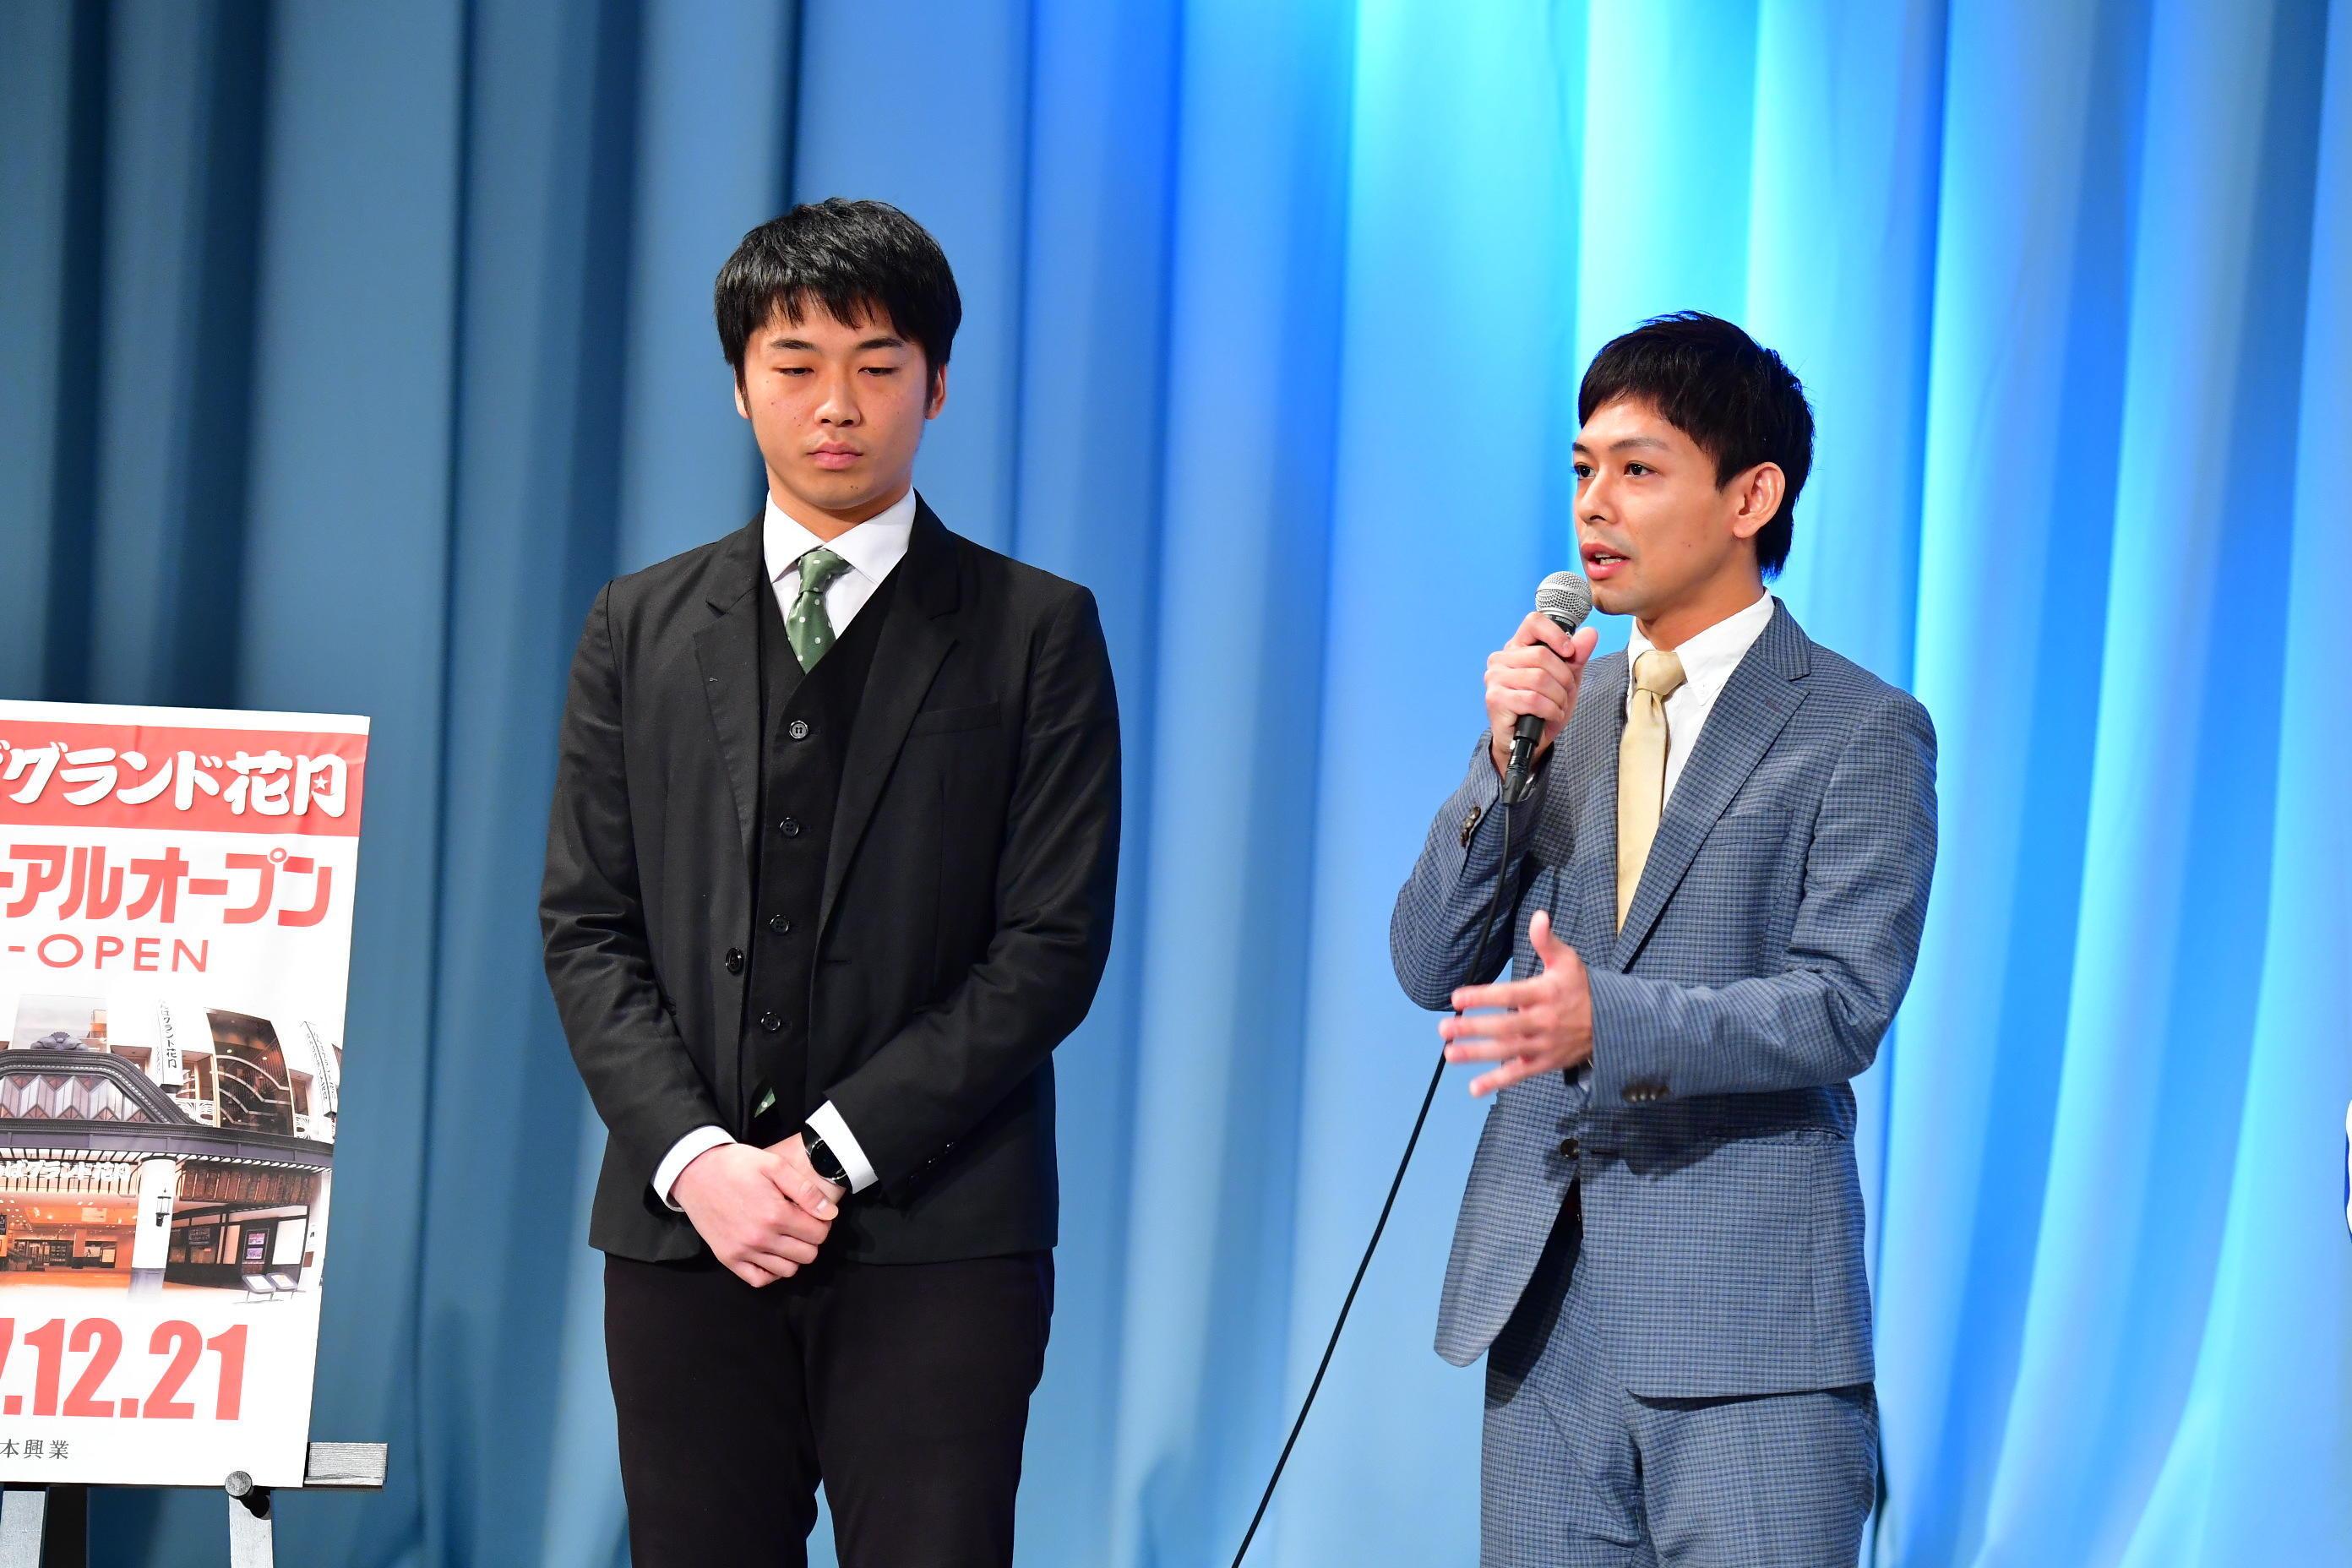 http://news.yoshimoto.co.jp/20171207223413-c837b5377356aca15489aa48c047b7c4547fa344.jpg